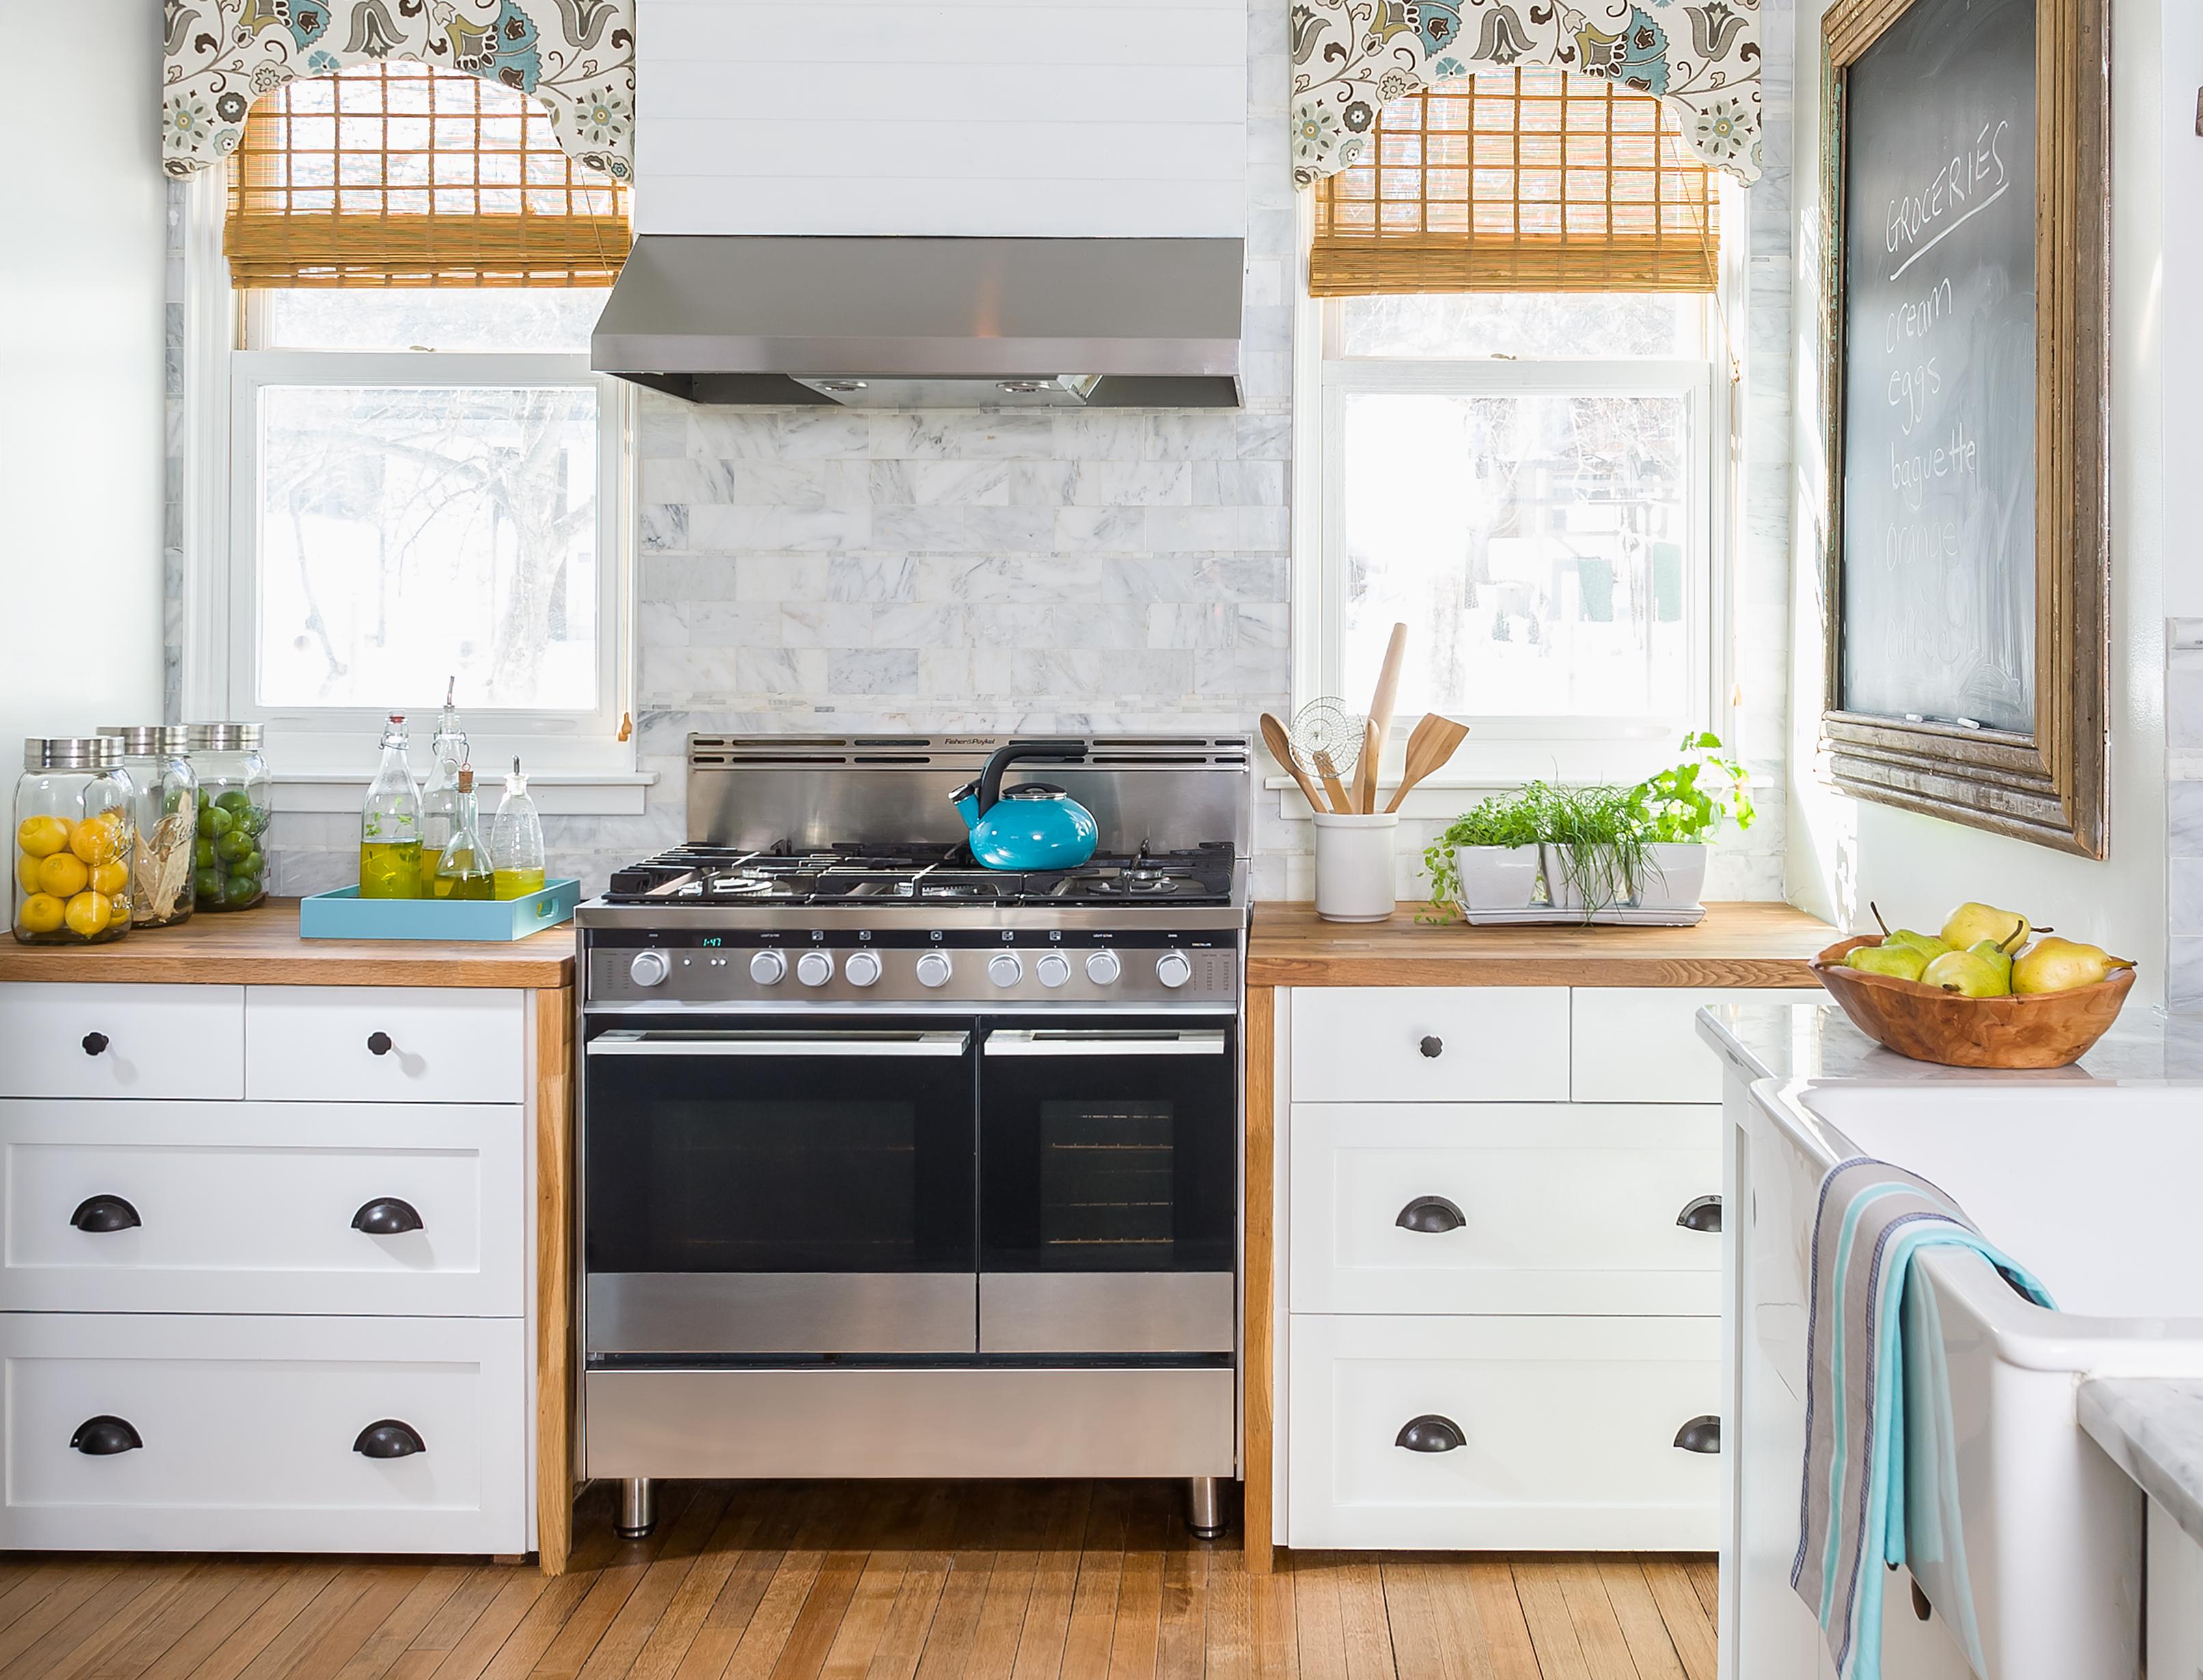 Kitchen Stove, Appliances